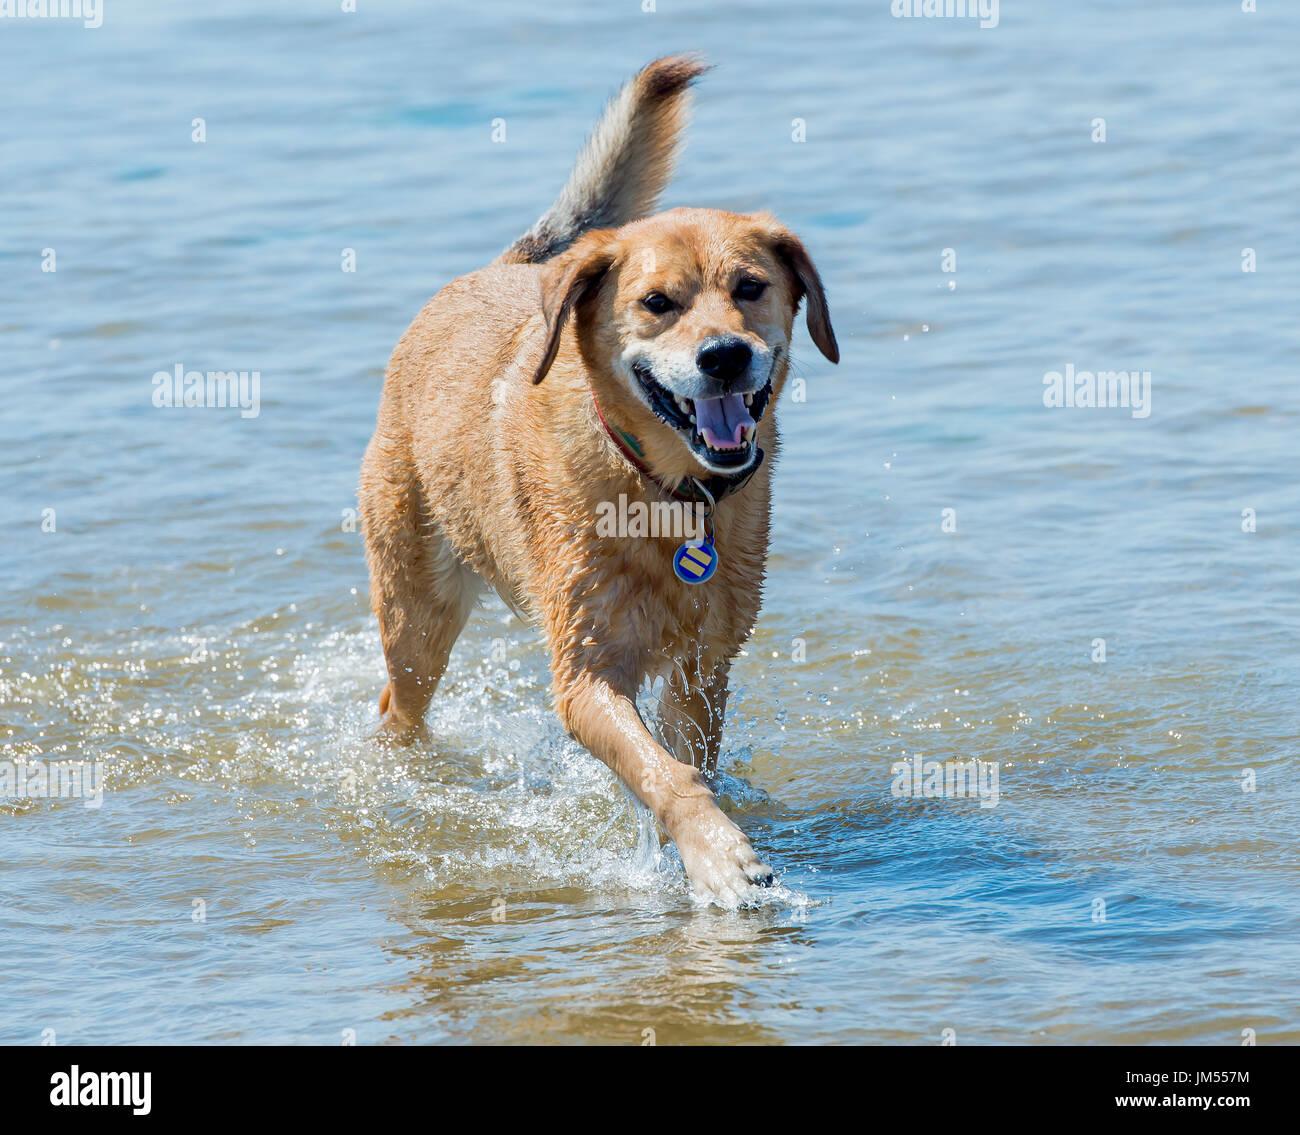 Dog With Floppy Ears Stock Photos & Dog With Floppy Ears Stock ...